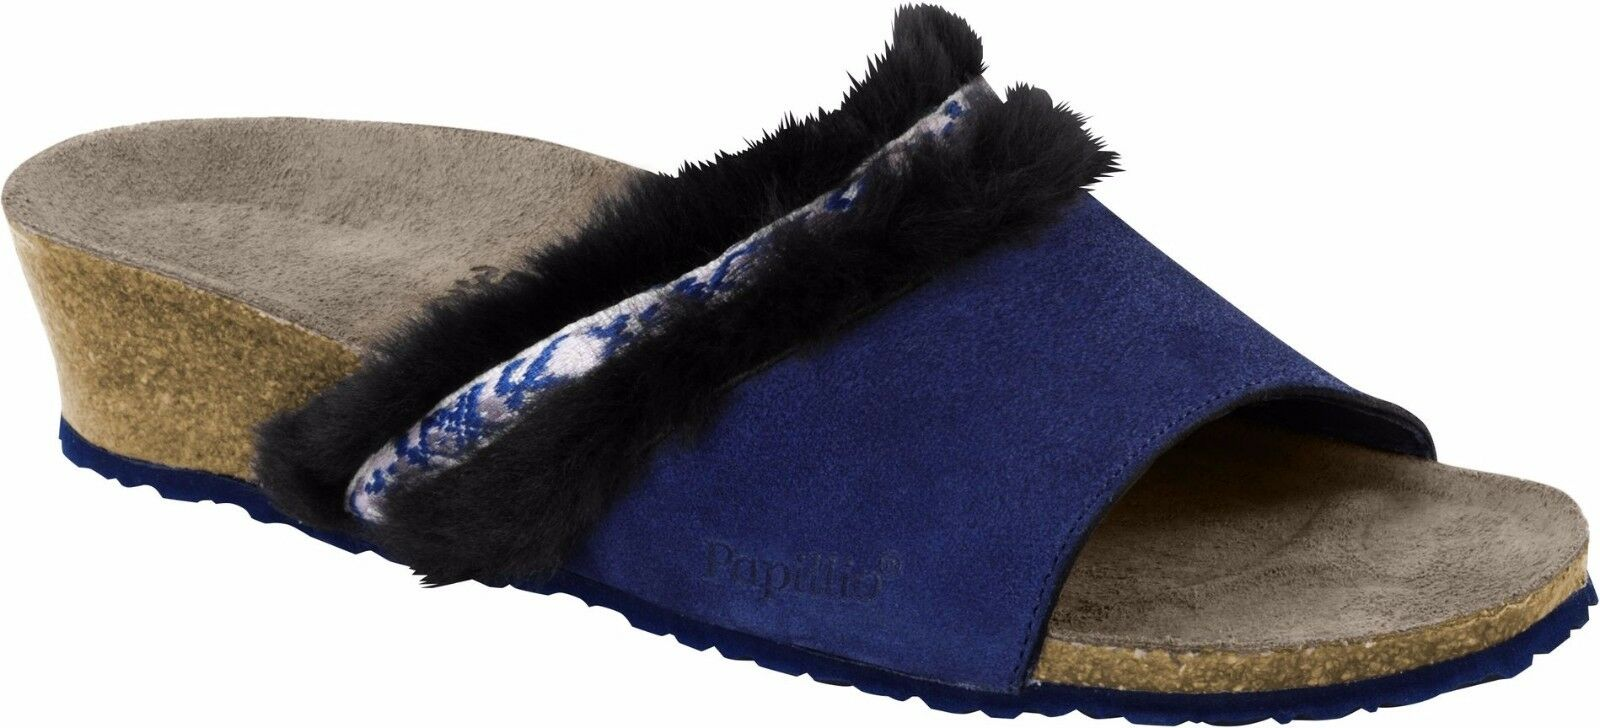 Último gran descuento Papillio Amber Cozy Night Blue Veloursleder/Fell Größe 38 Fußbett schmal